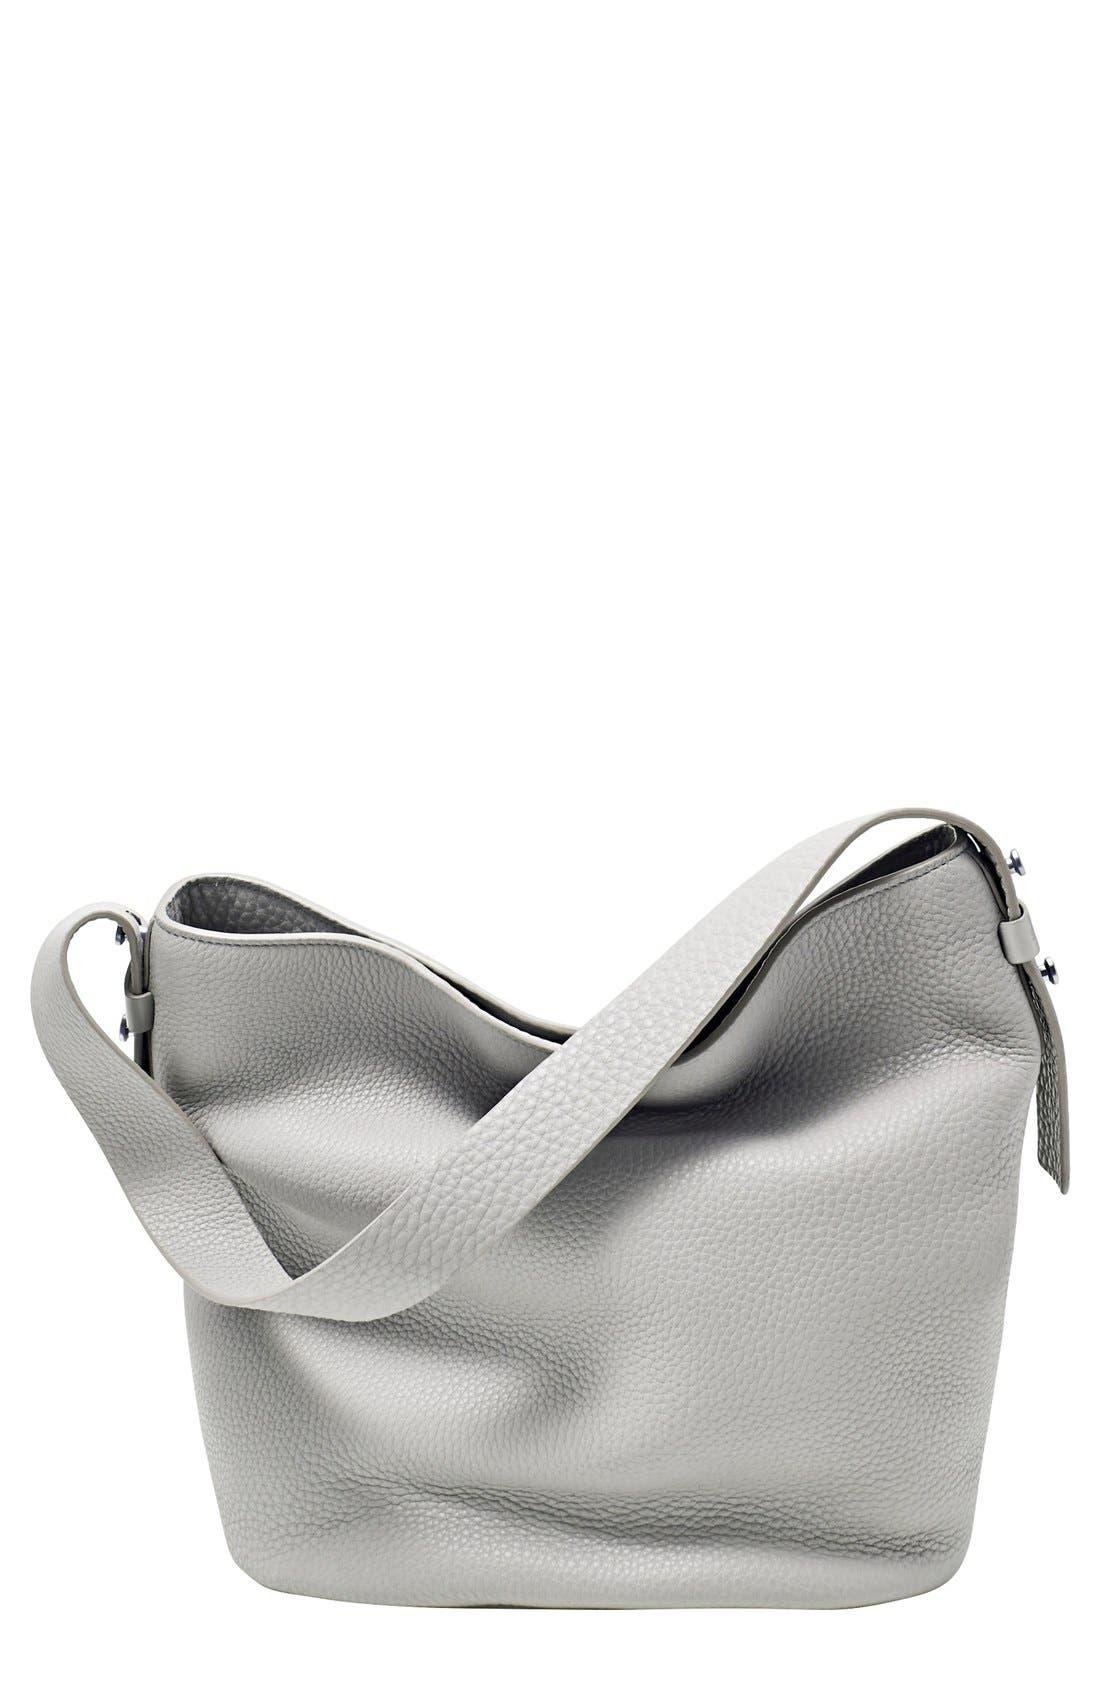 Main Image - Skagen 'Karyn' Mini Bucket Bag